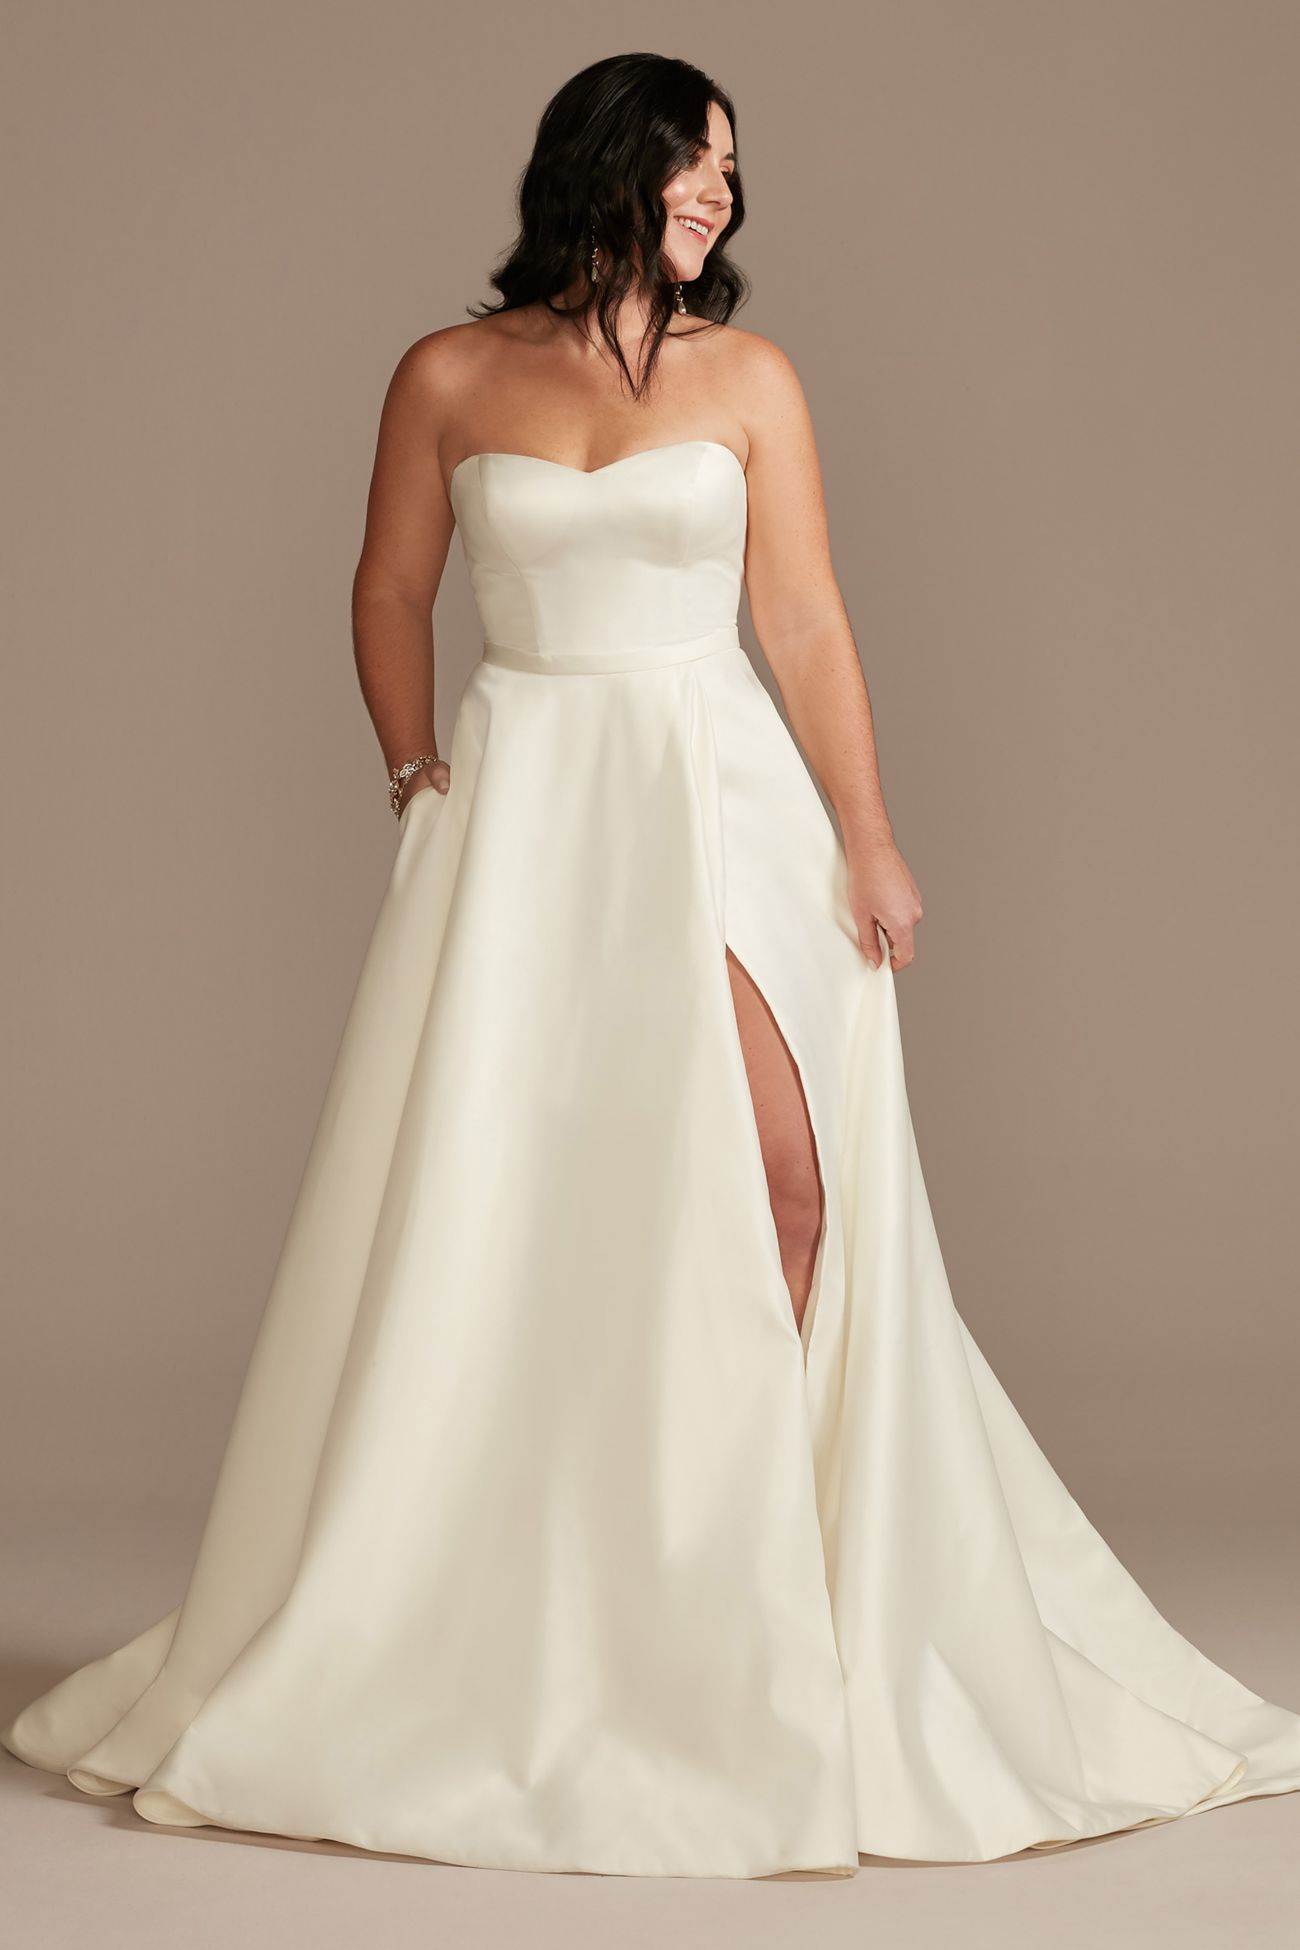 David's Bridal sweetheart neckline high-slit dress